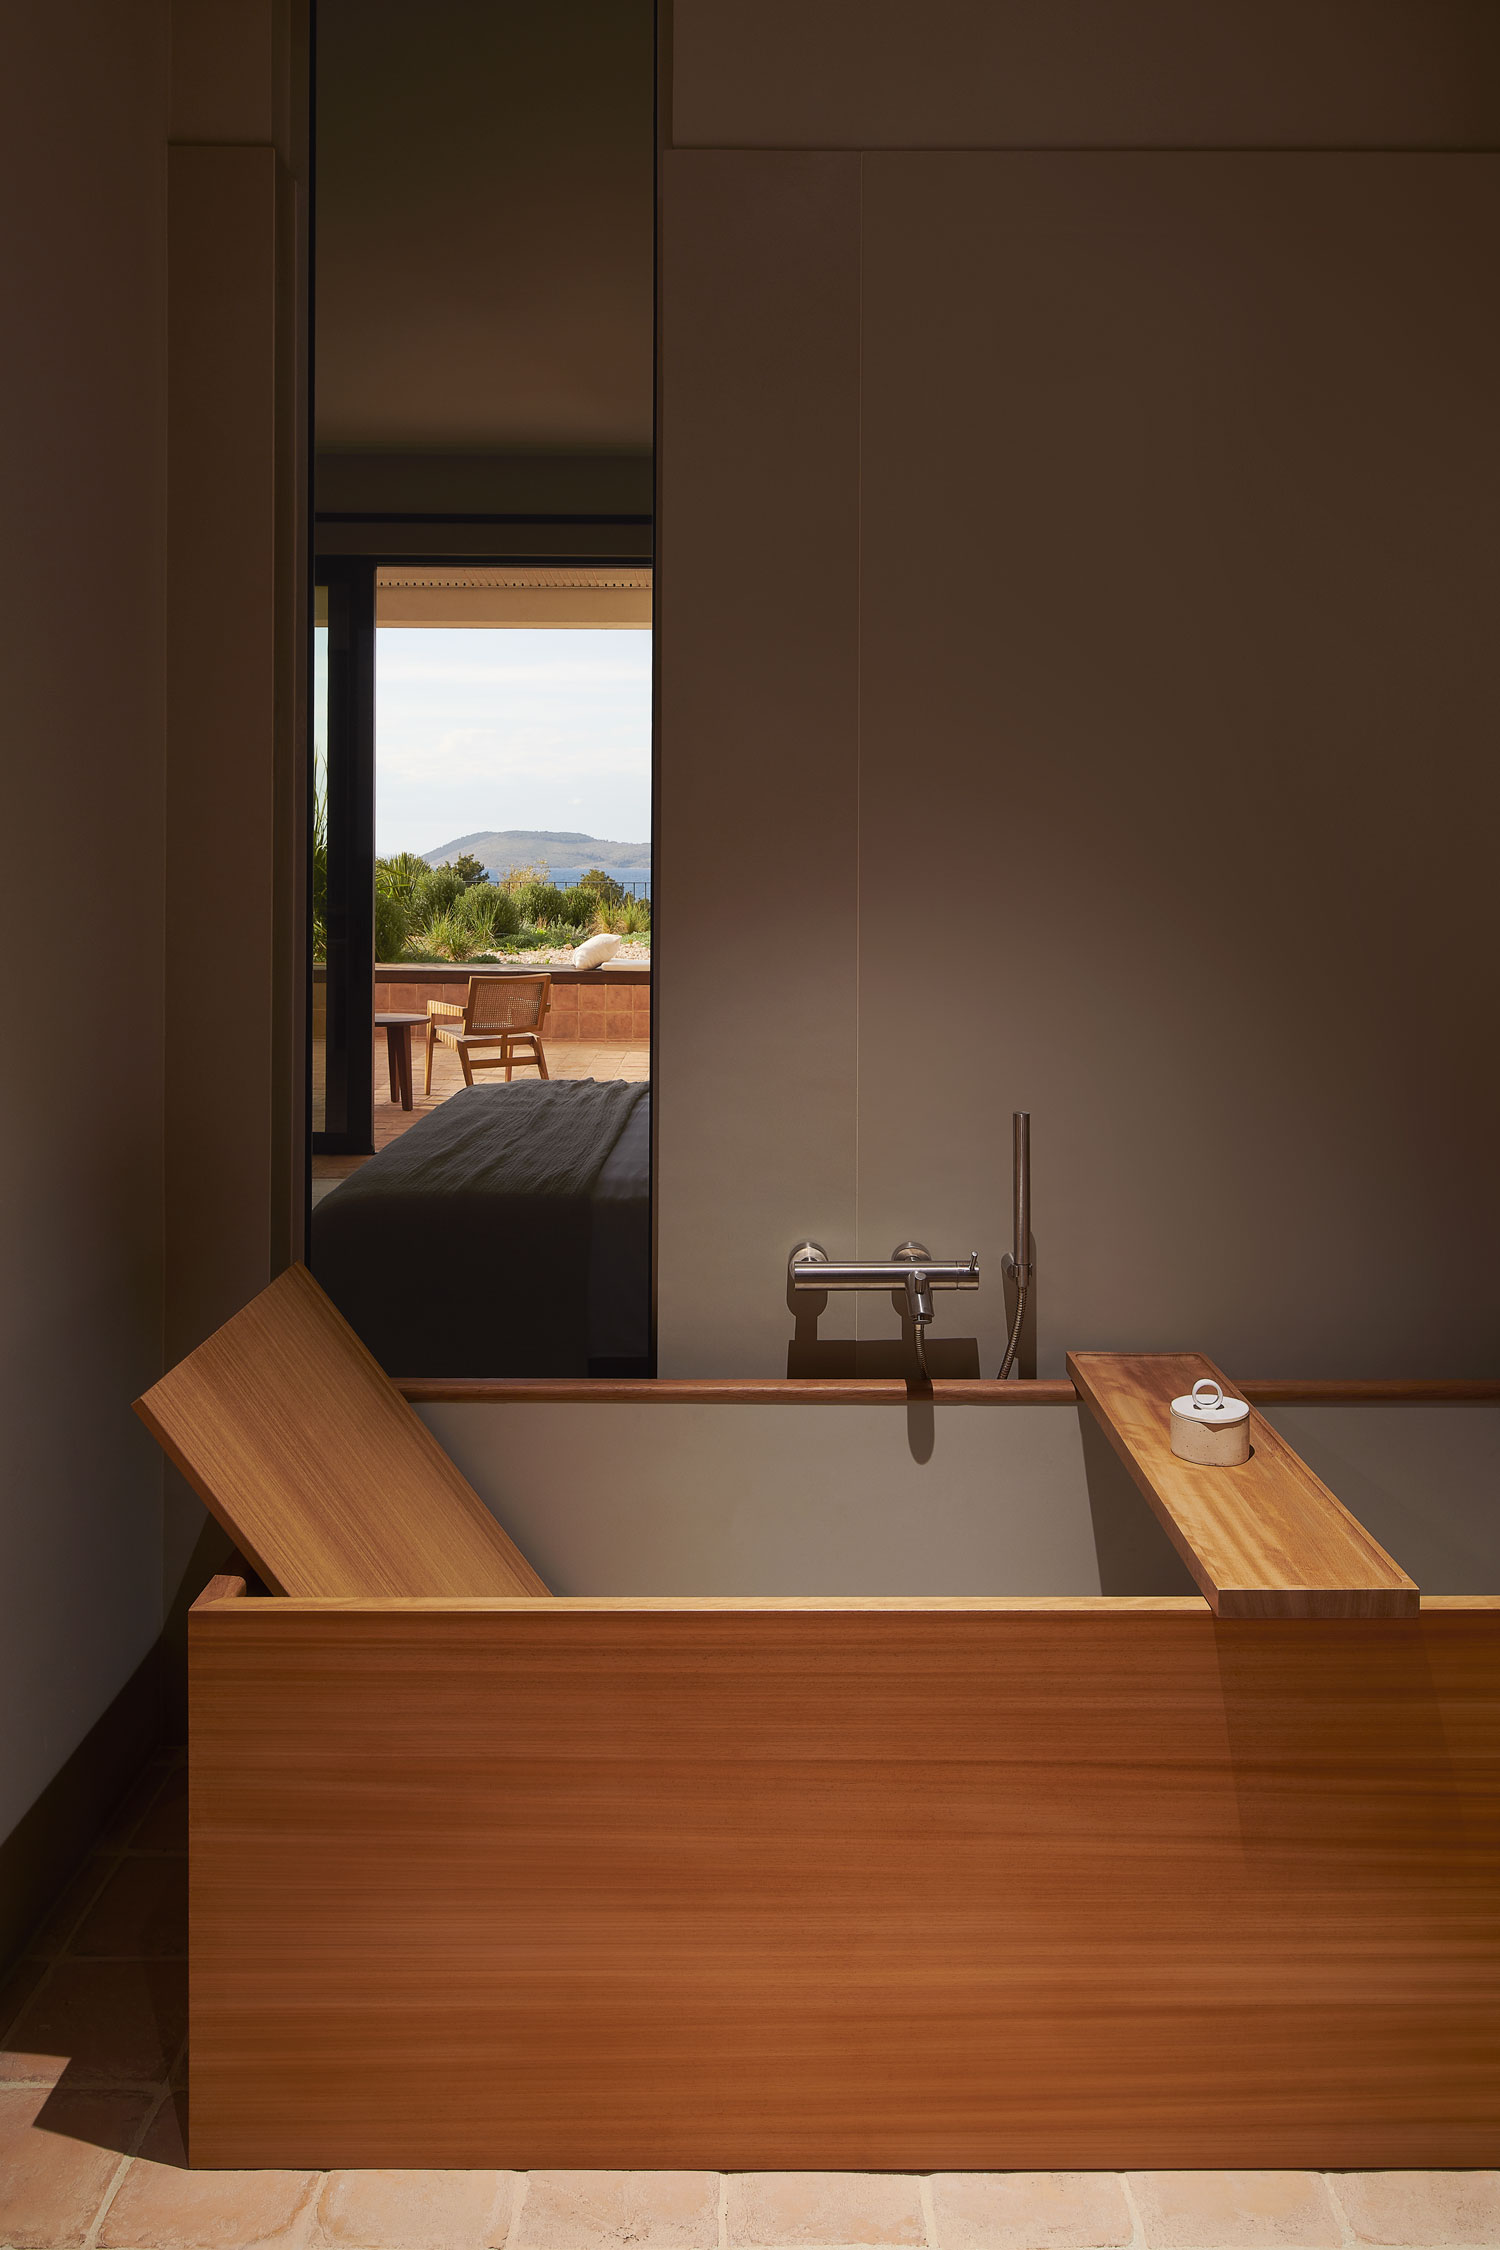 Lam Studio Hotel Maslina Hvar Croatia Luxury Accommodatino Photo Claire Israel Yellowtrace 12